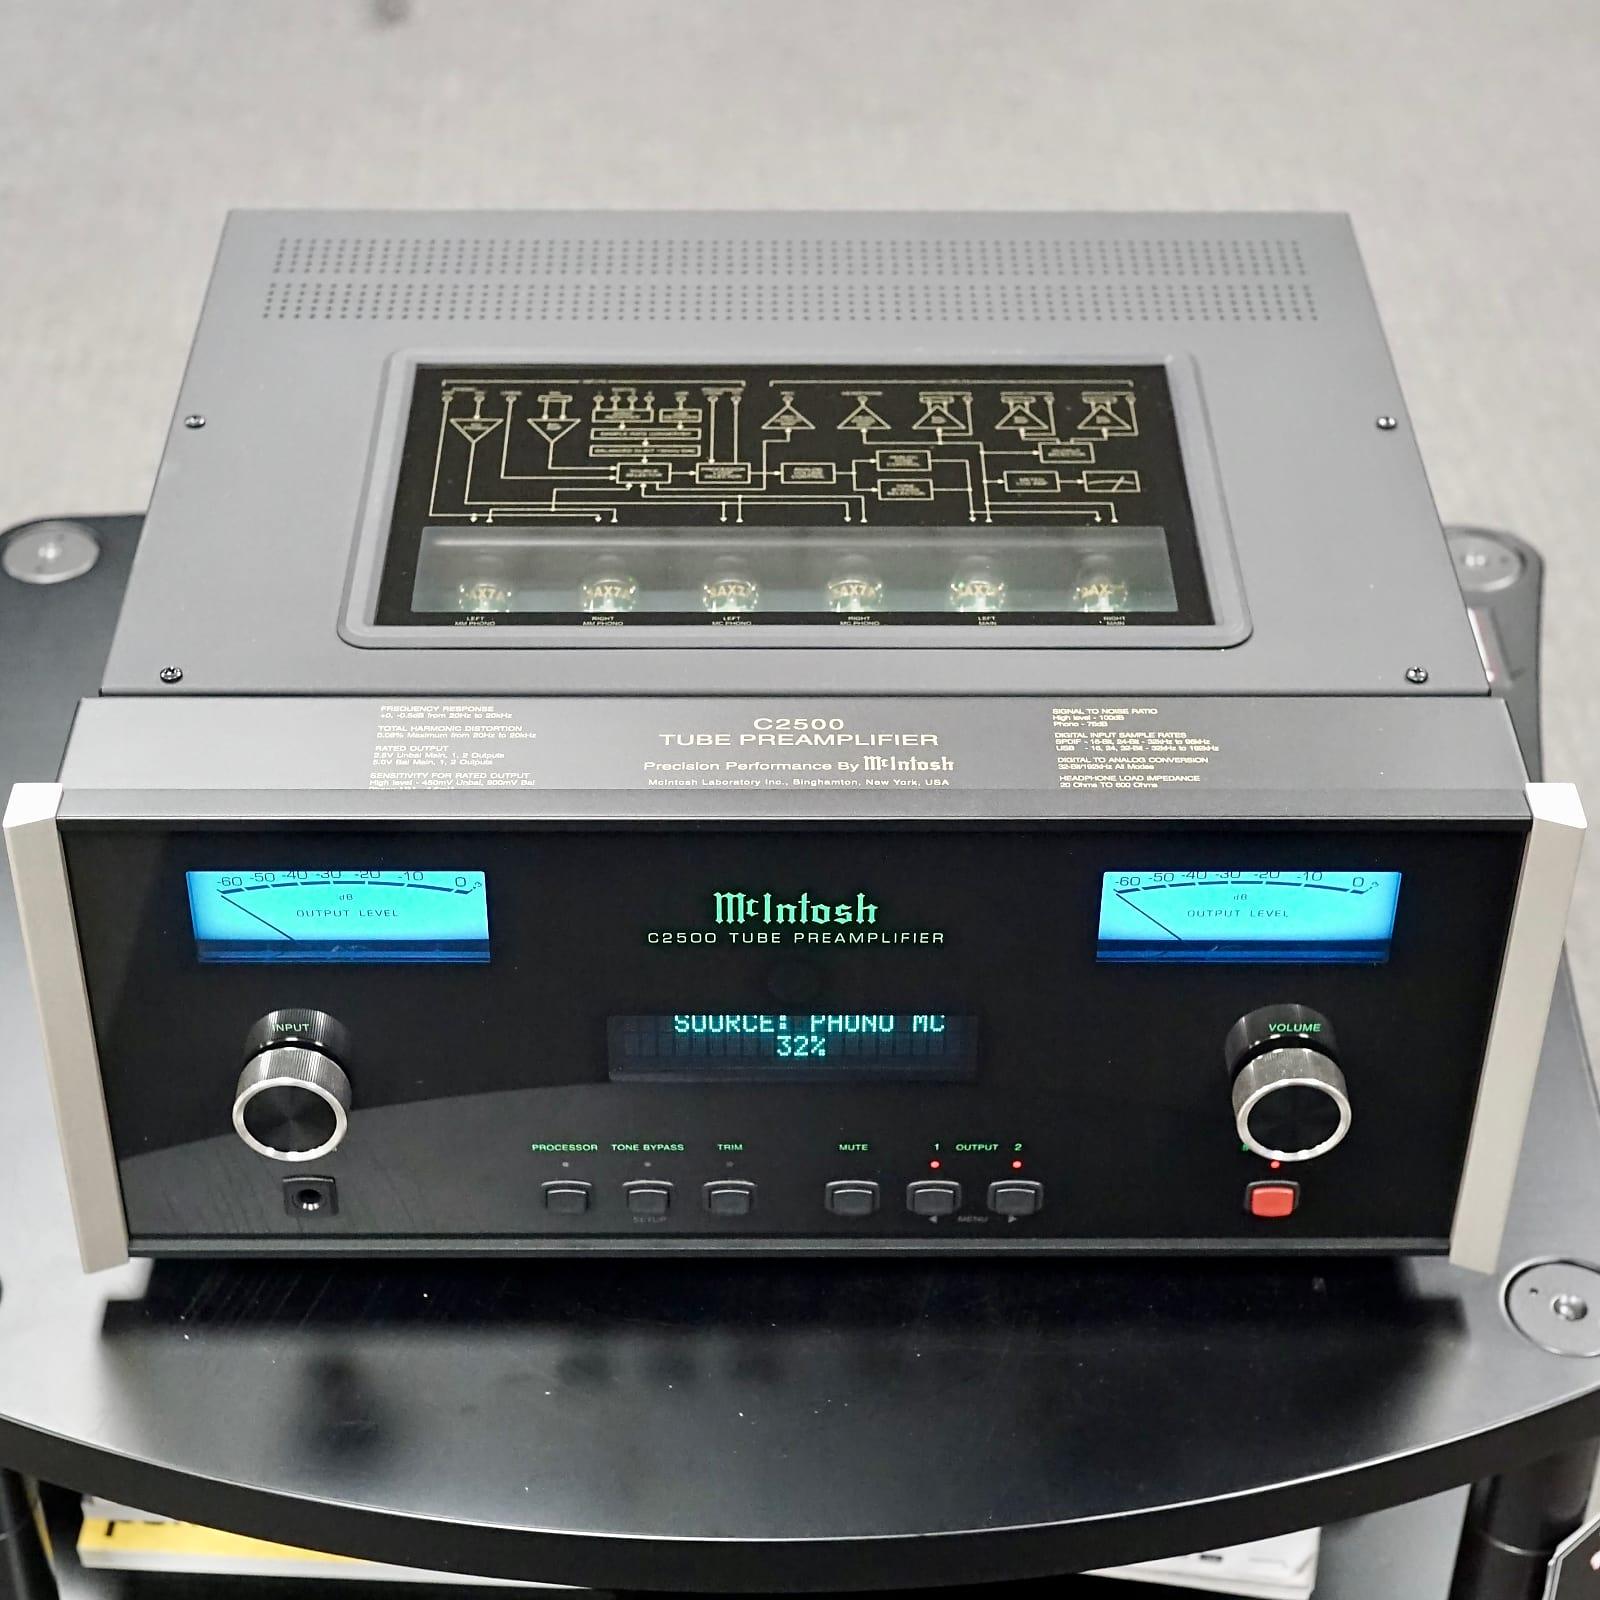 McIntosh C-2500 Vacuum Tube Preamplifier w/ Org Box, Remote, Etc - Near Mint